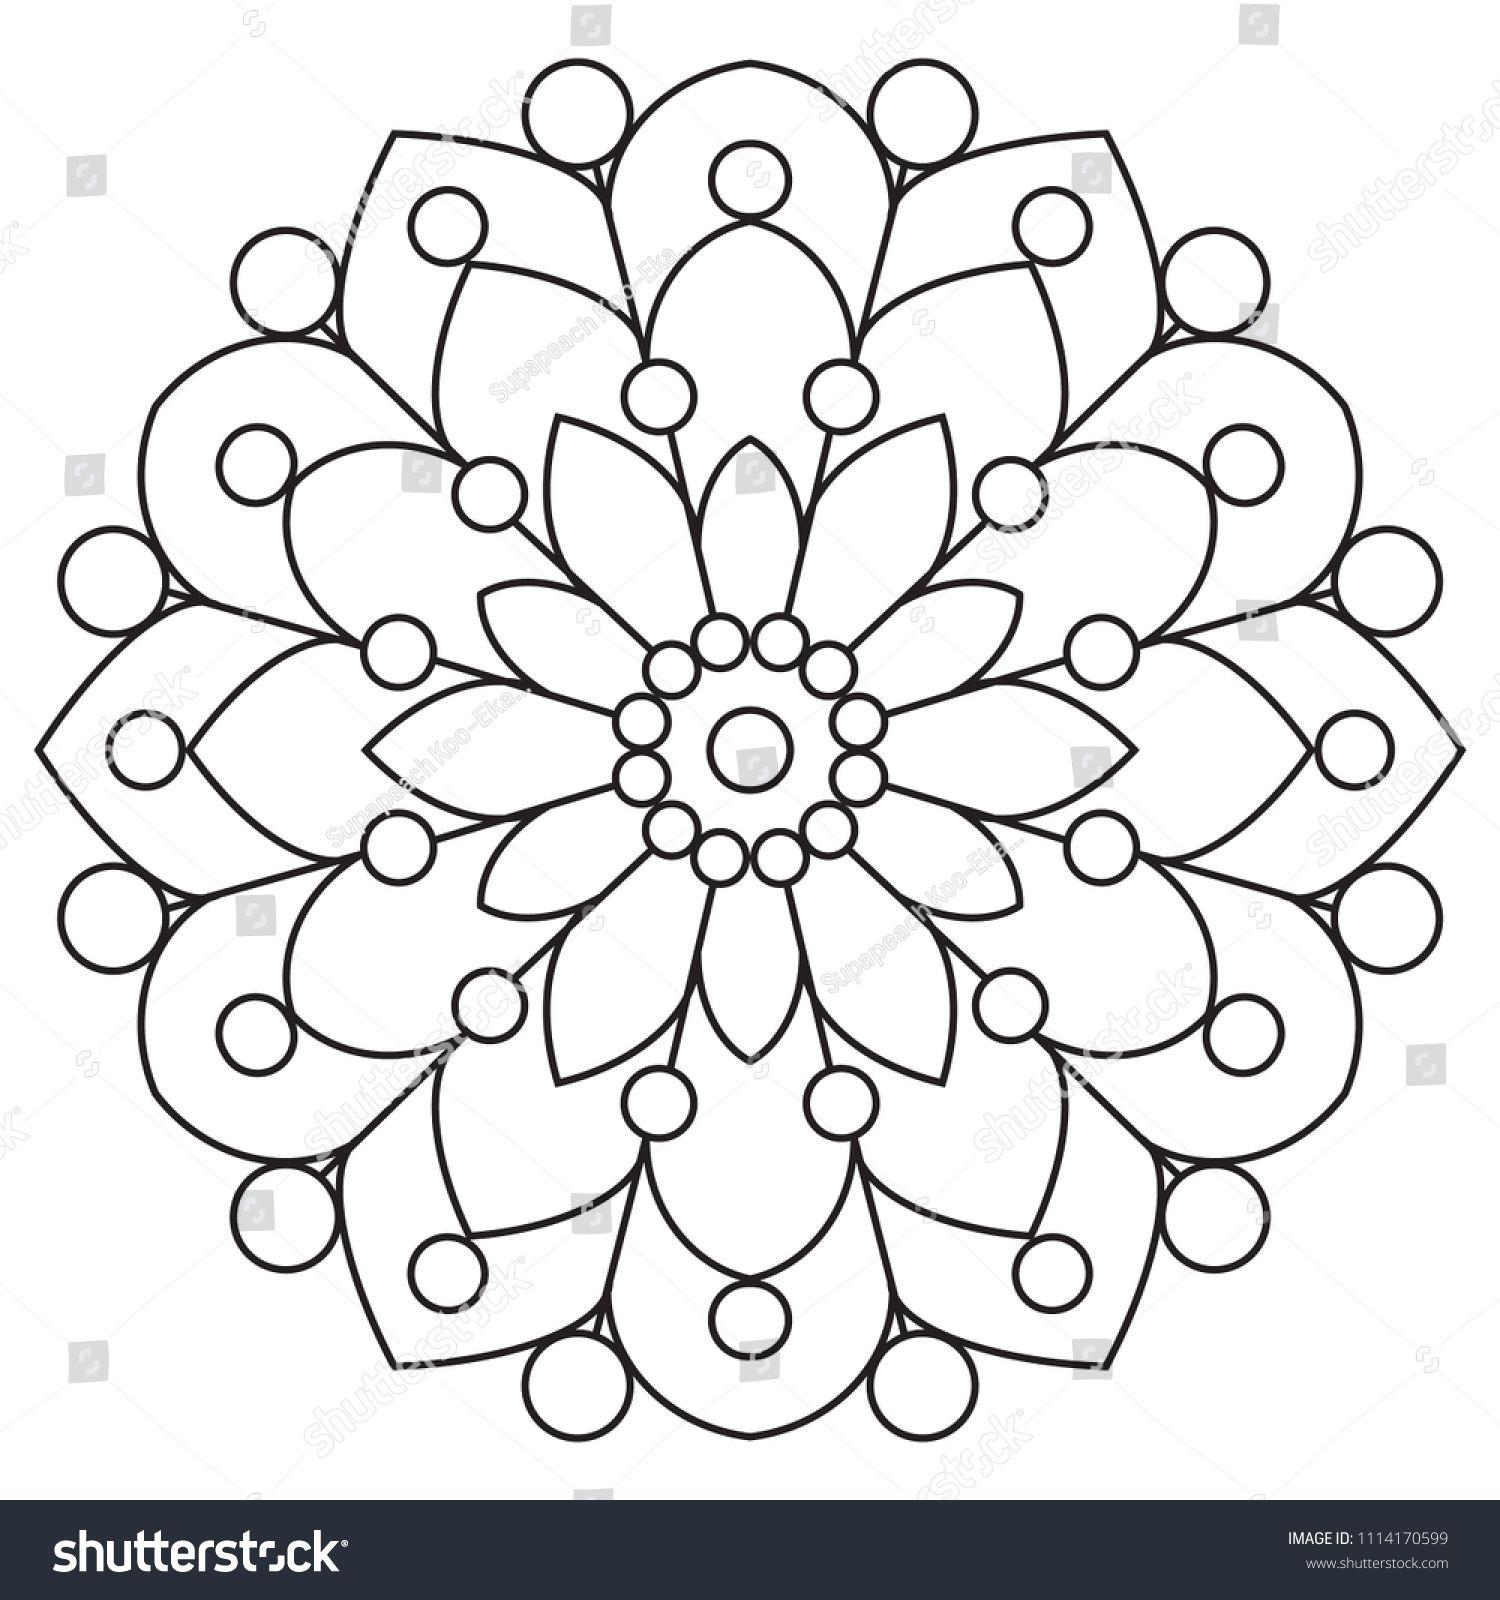 Easy Mandalas For Relaxation Meditation Coloring Basic Mandala In Circle Floral Shape For Beginner Easy Mandala Drawing Simple Mandala Design Simple Mandala